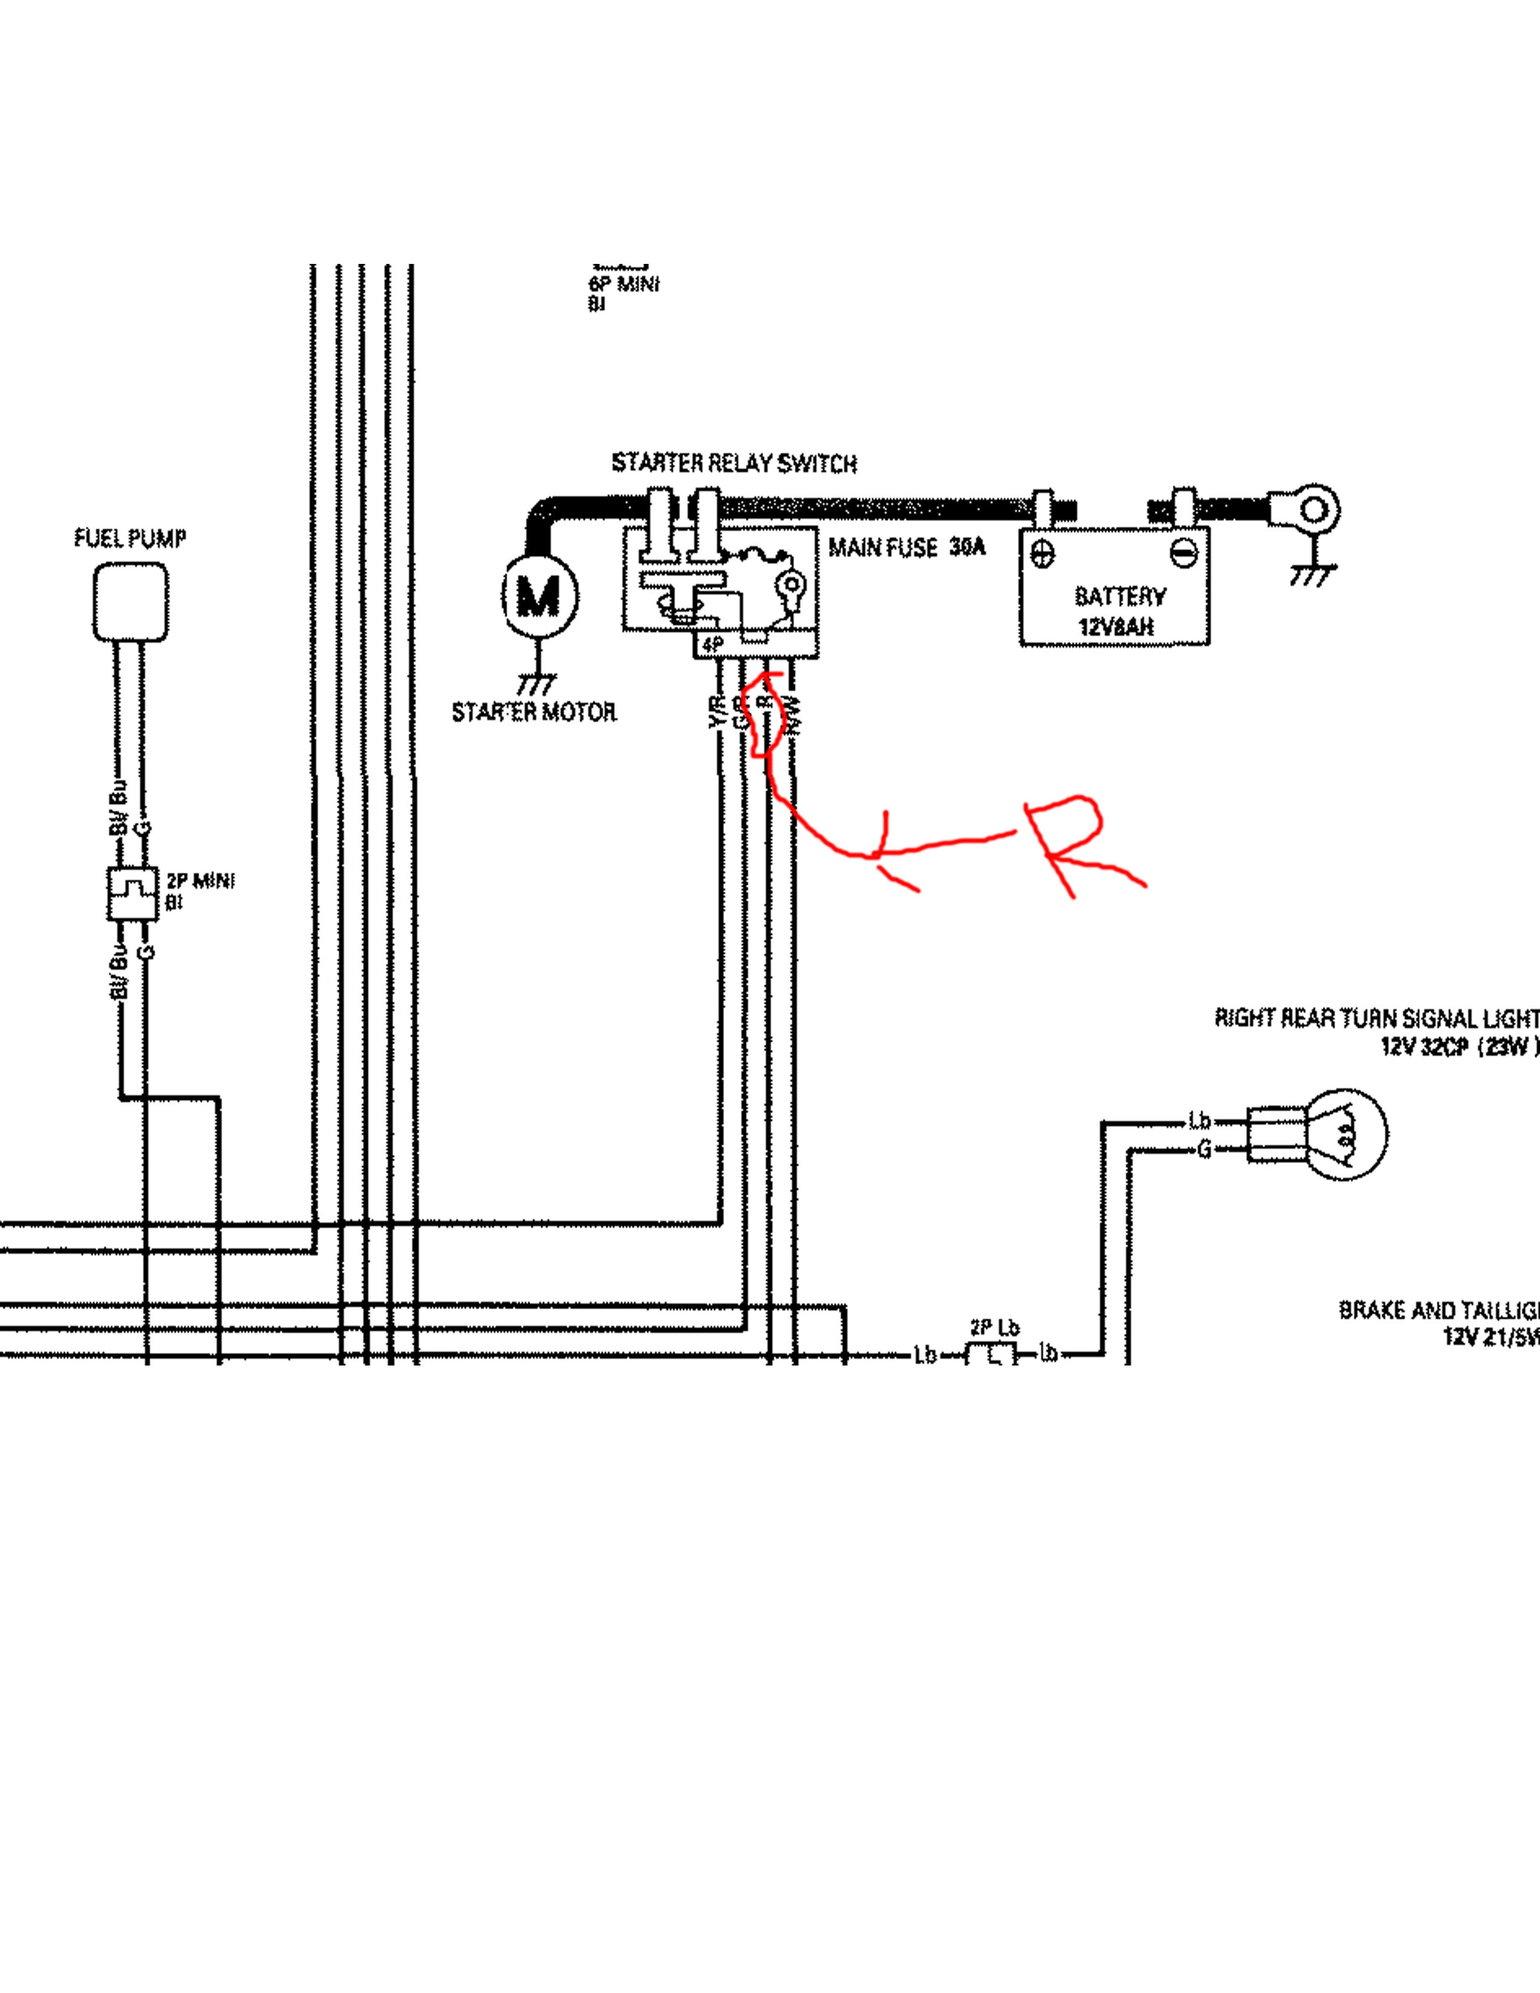 Wiring Diagram PDF: 12 Volt Solenoid Wiring Diagram Honda 320